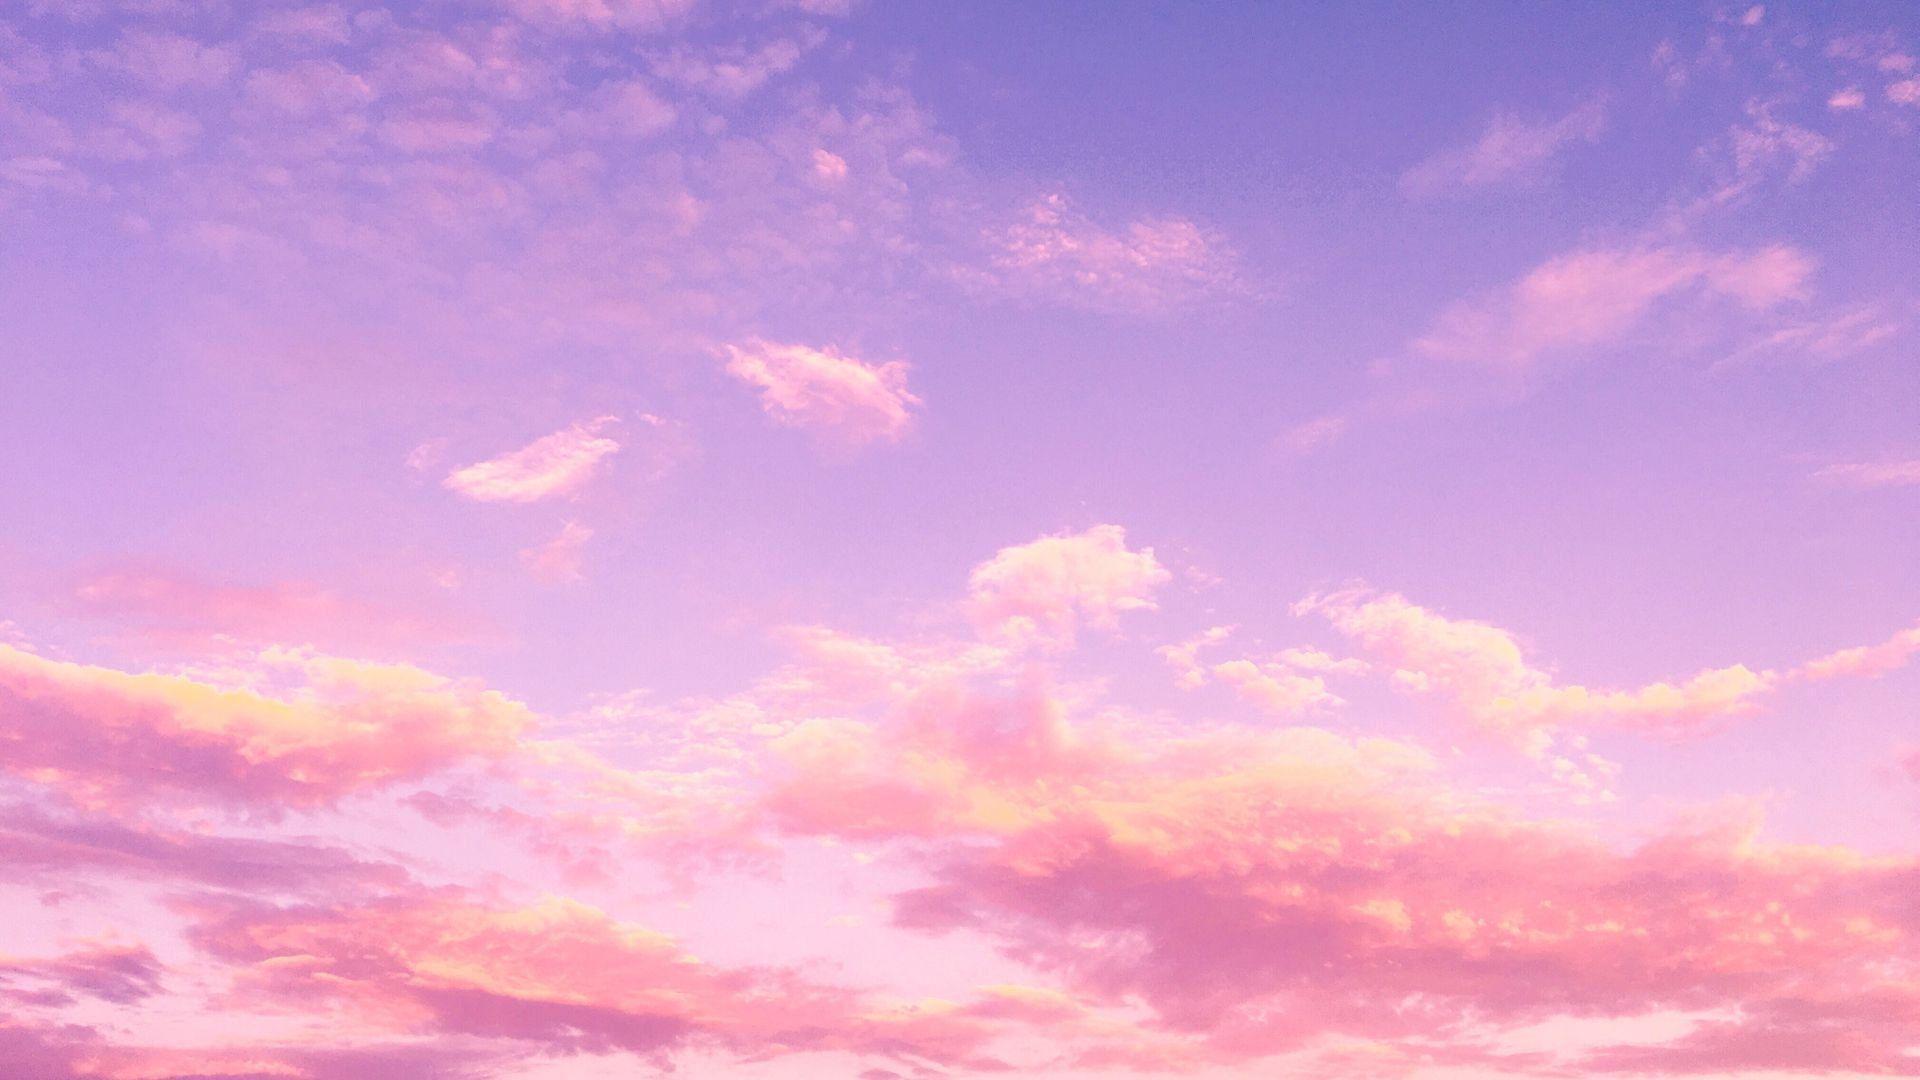 Pink Sky Desktop Wallpapers Top Free Pink Sky Desktop Backgrounds Wallpaperaccess